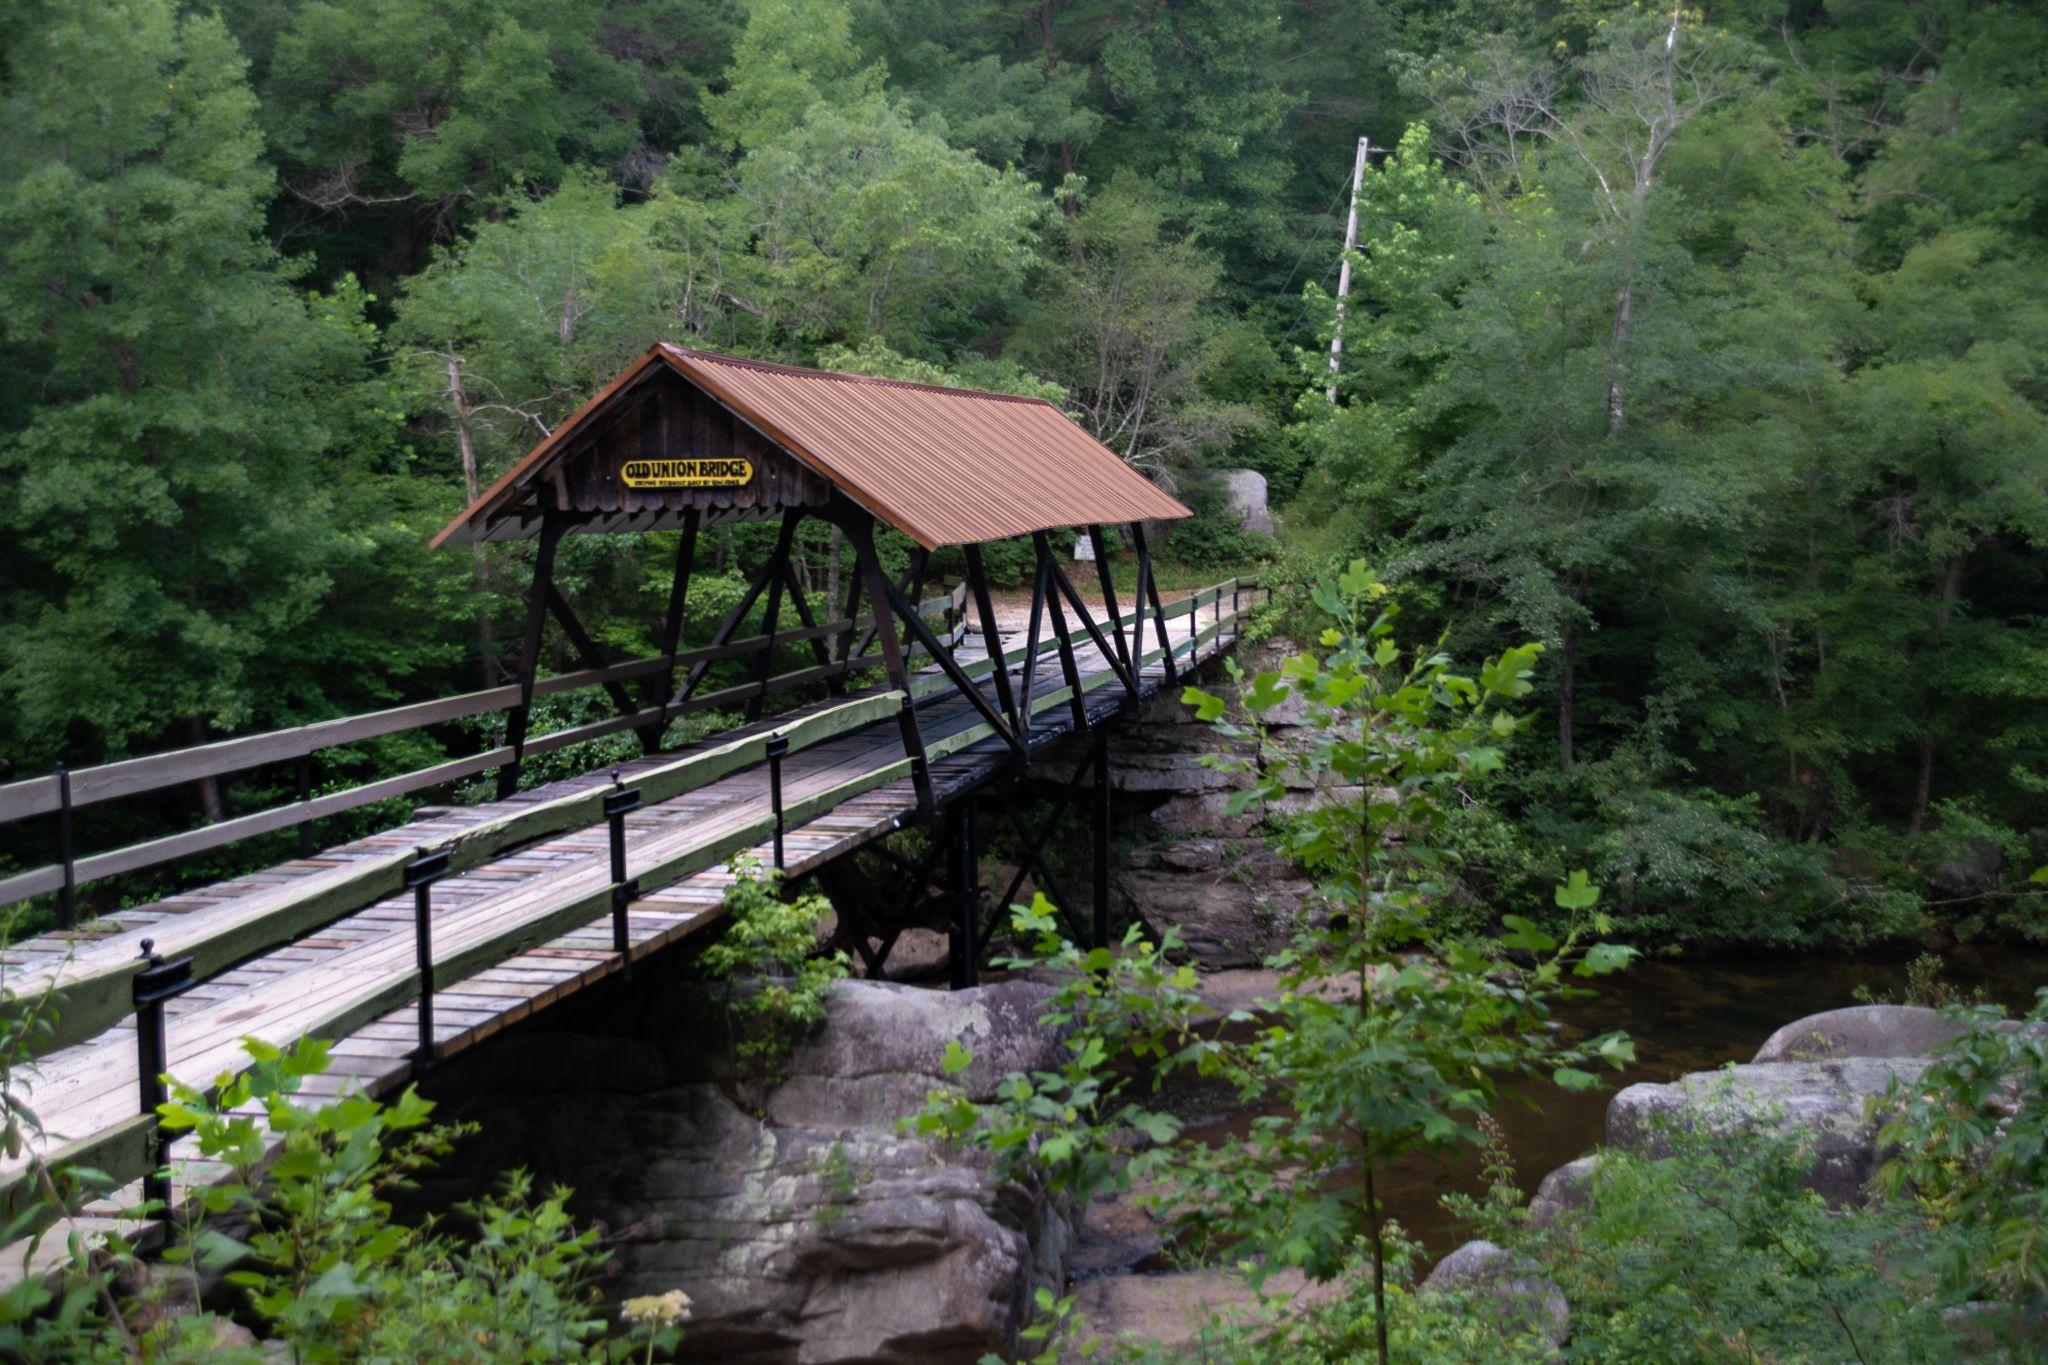 Union Bridge, USA